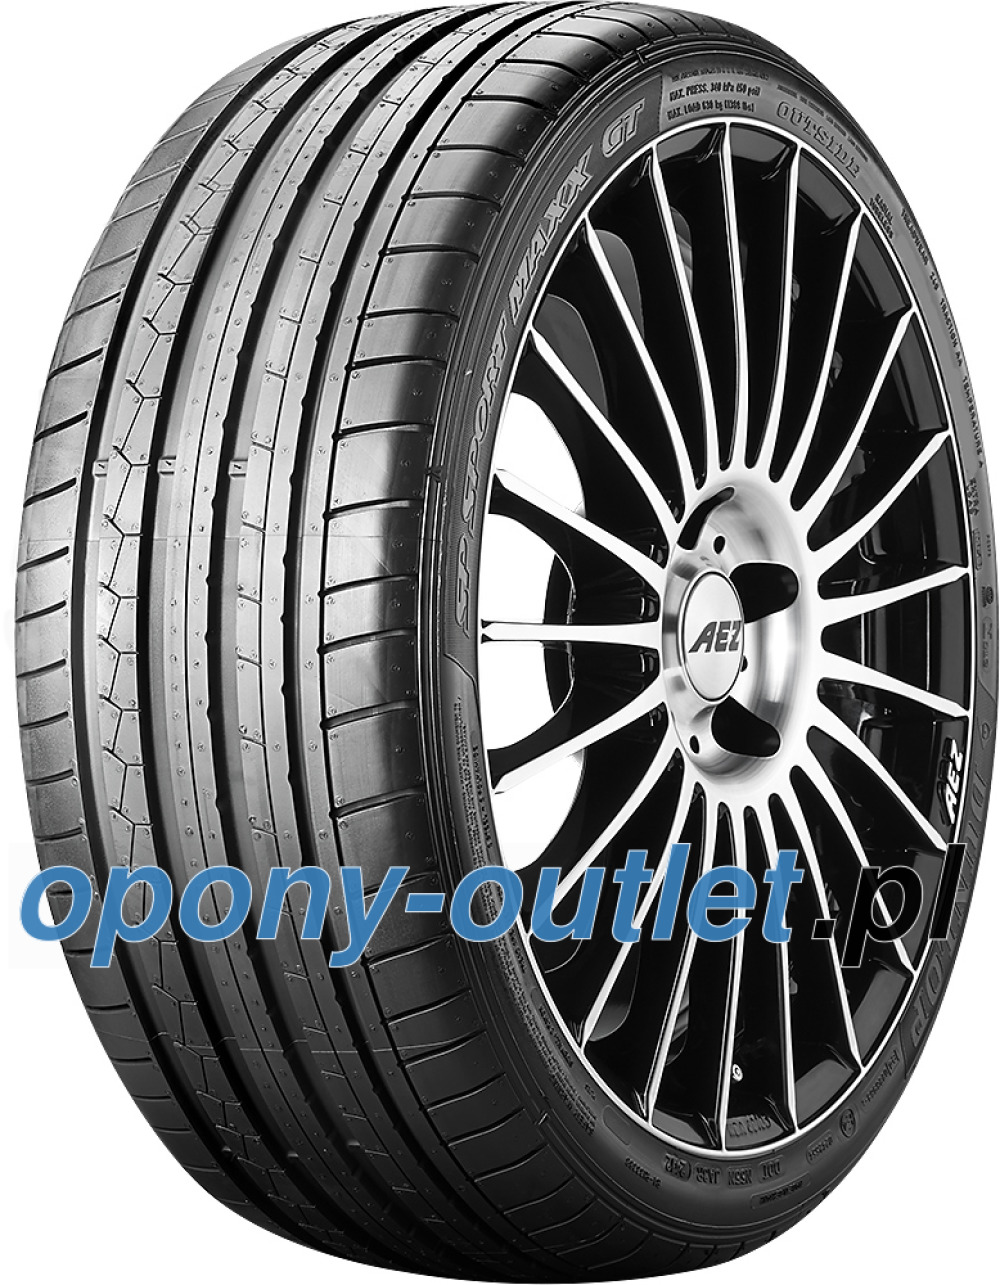 Dunlop SP Sport Maxx GT ( 275/35 ZR21 (103Y) XL osłona felgi (MFS), RO1 )